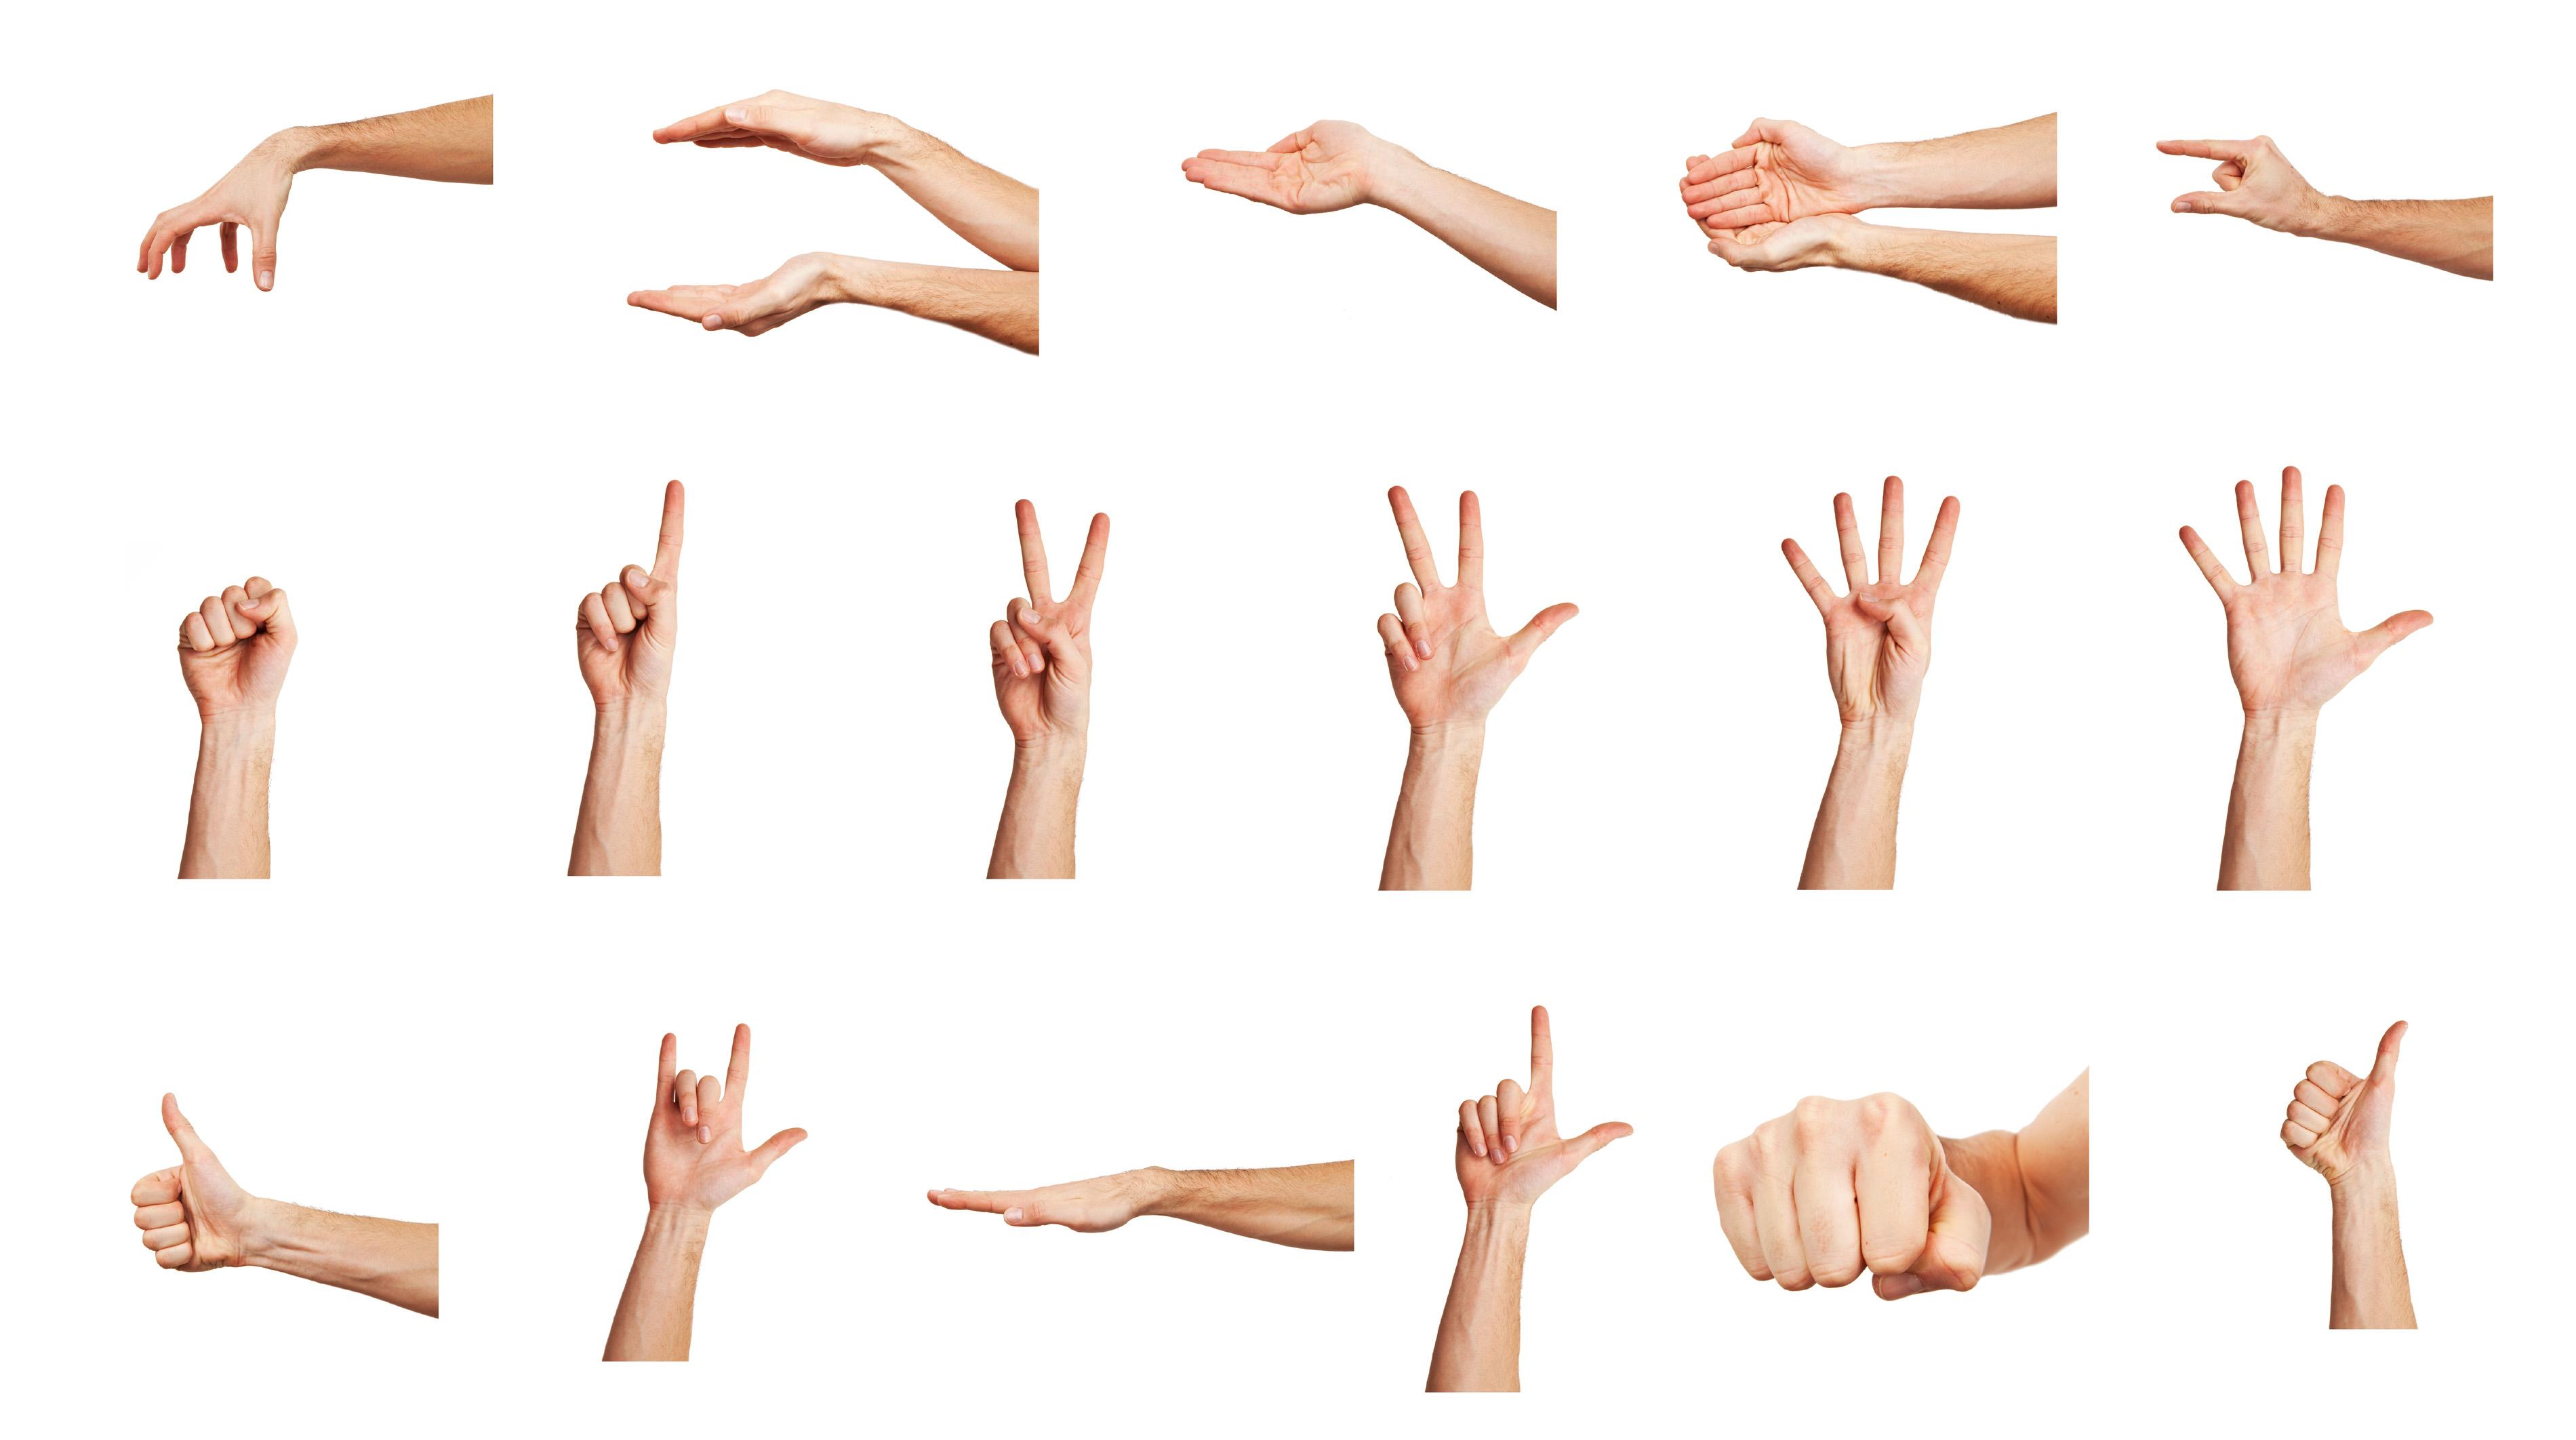 Hand Gesture #3